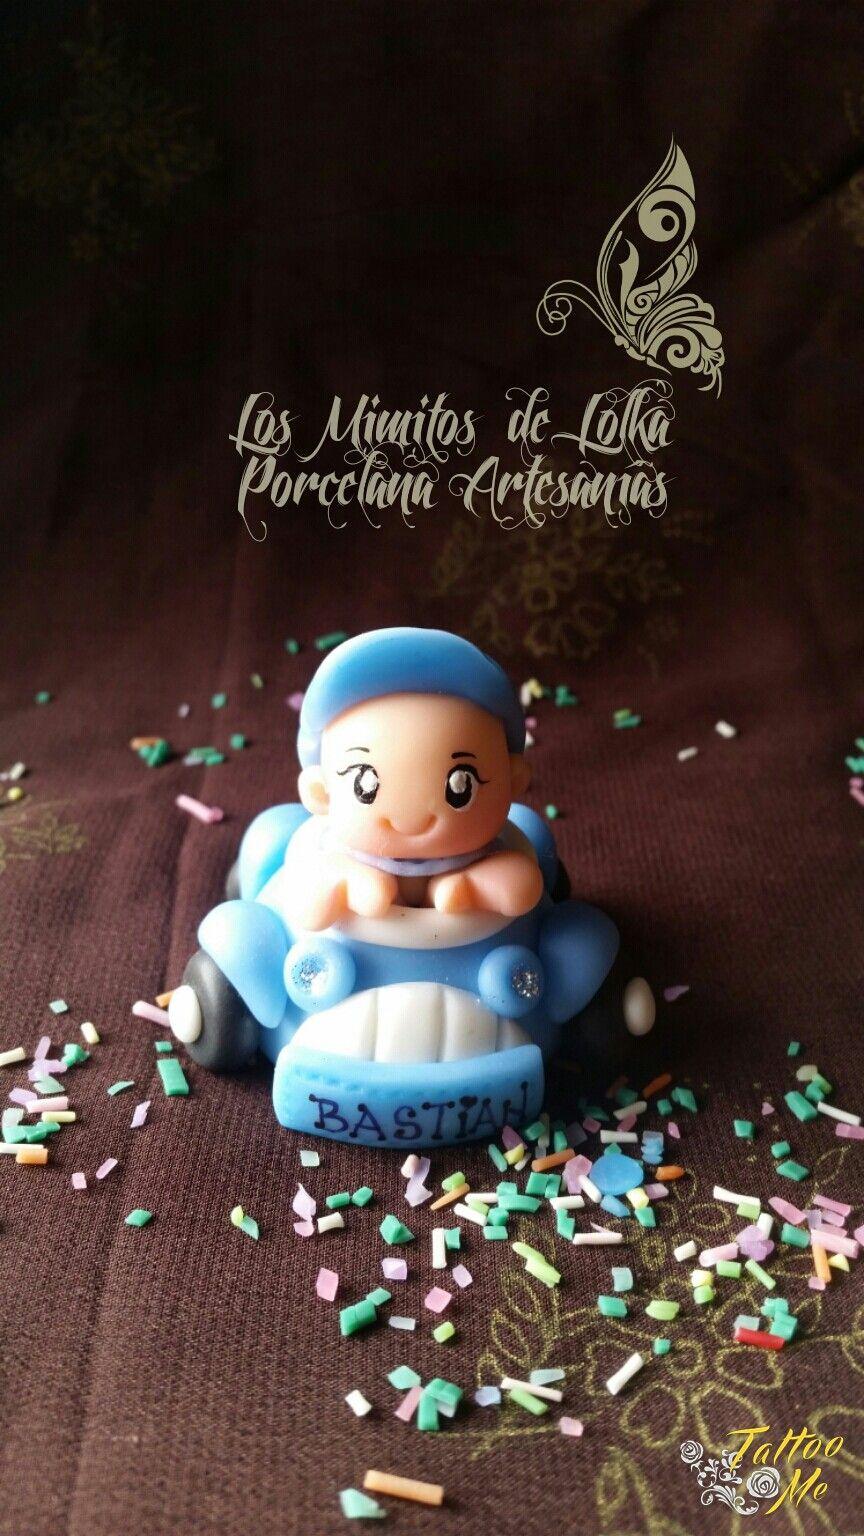 #Bebé en #autito de #porcelana fría #souvenir